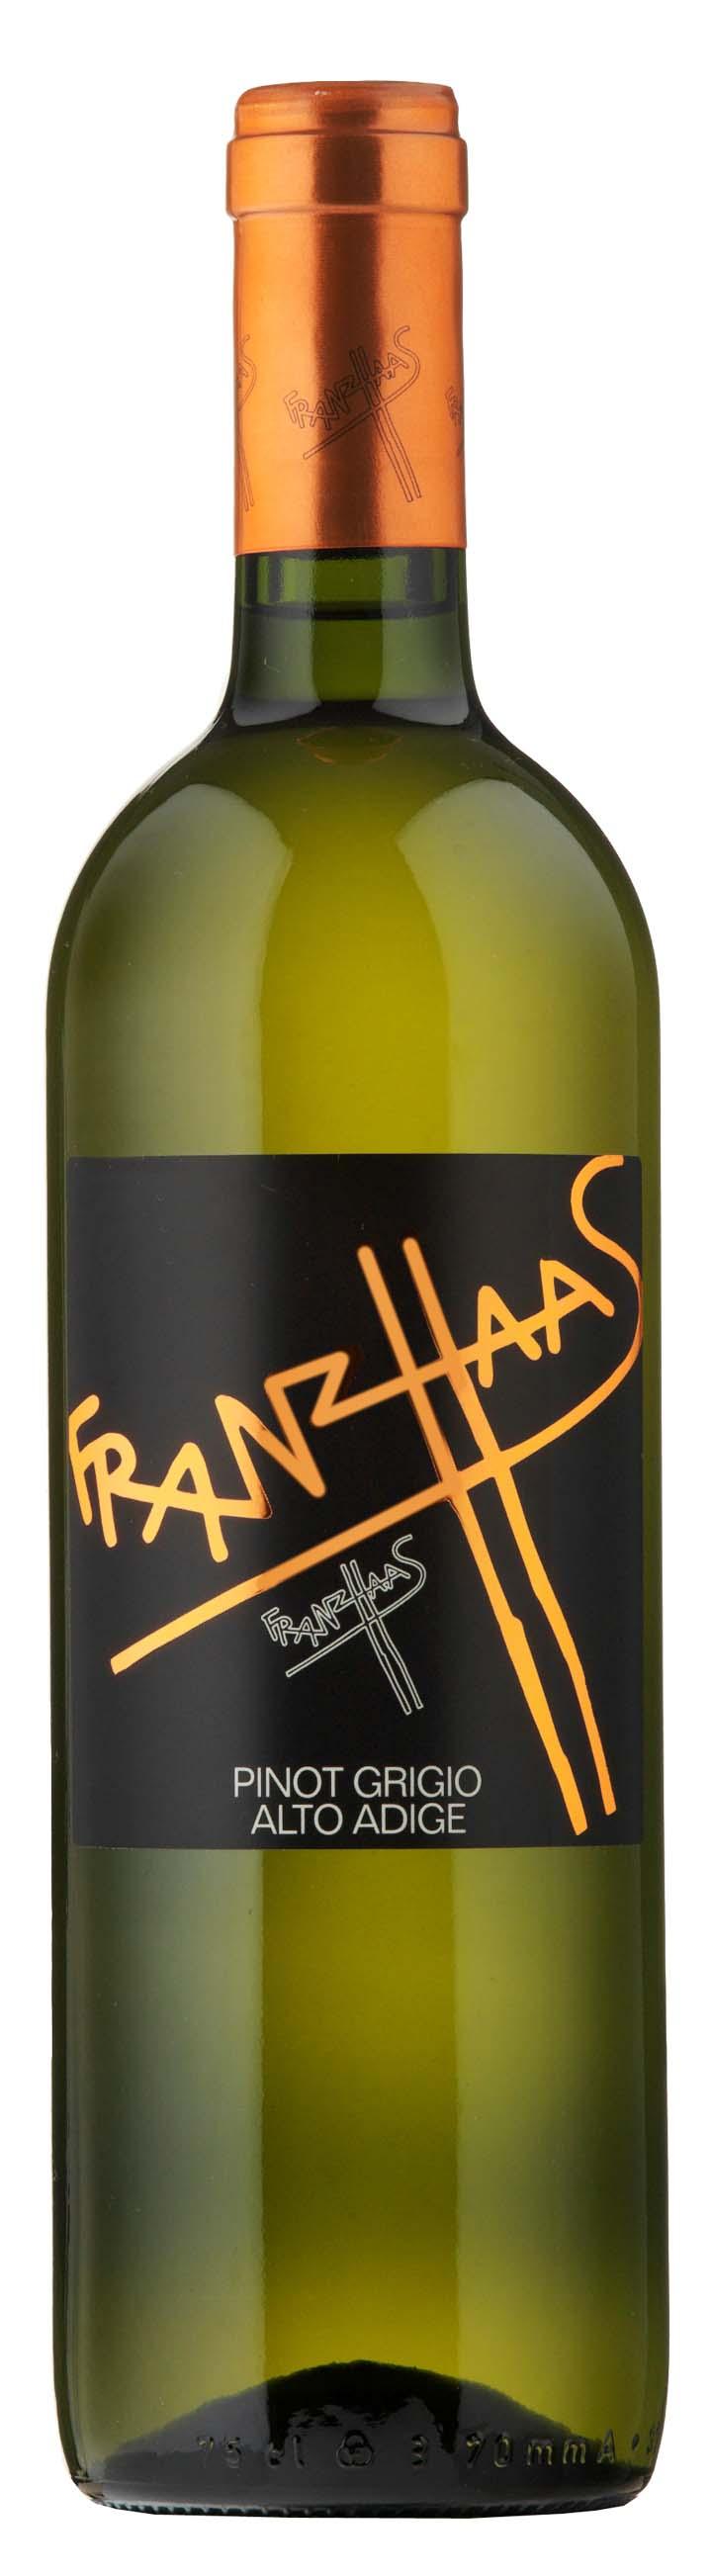 Franz Haas, Pinot Grigio 2016